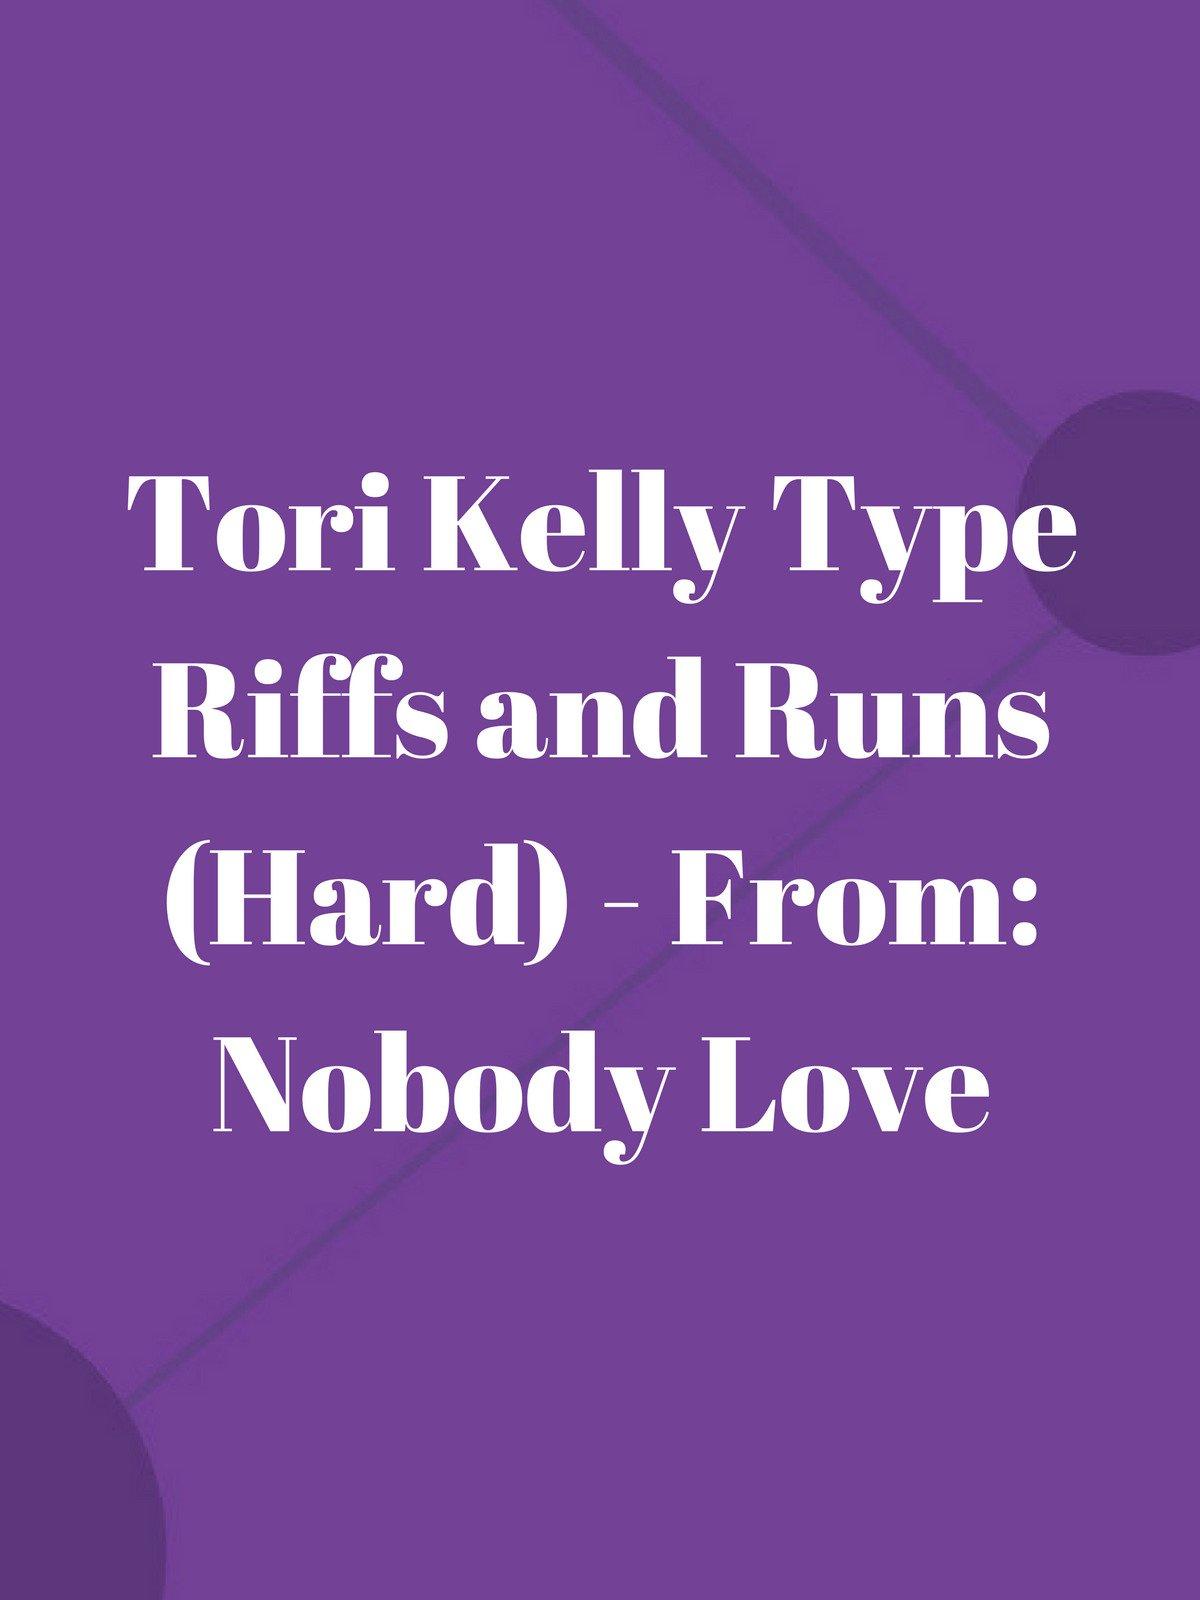 Tori Kelly Type Riffs and Runs (Hard)